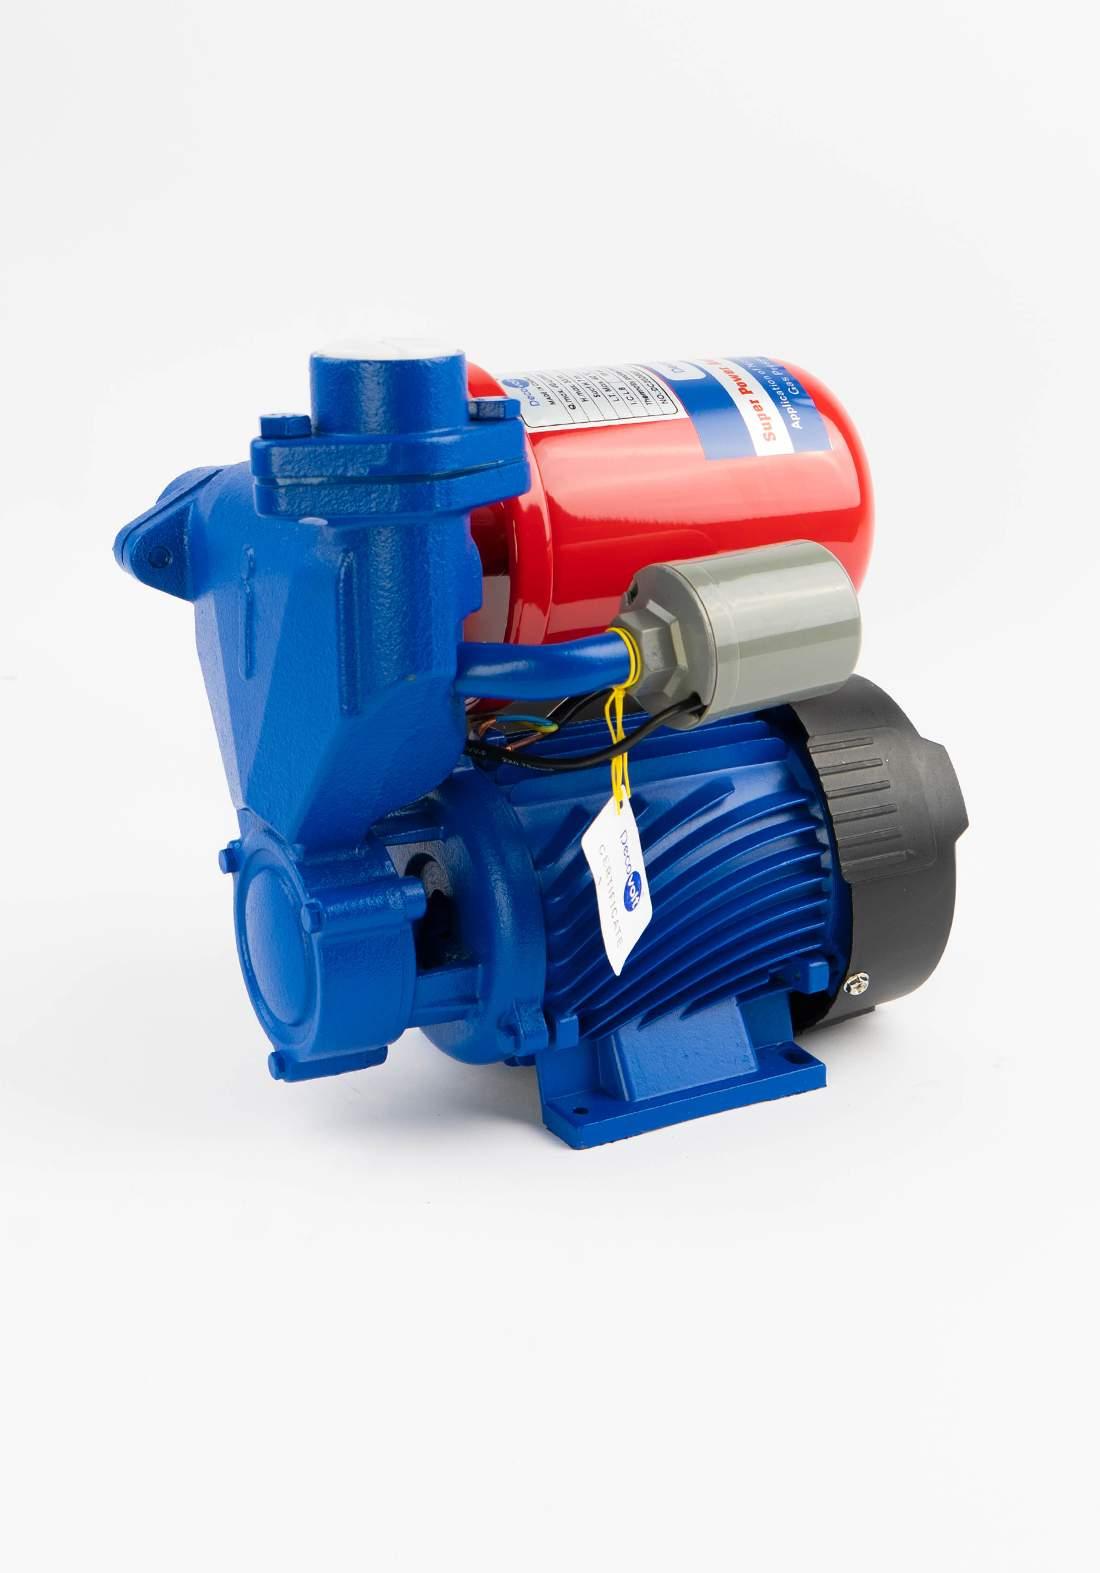 DecoVolt 4895 water pump 220w مضخة مياه 220 واط